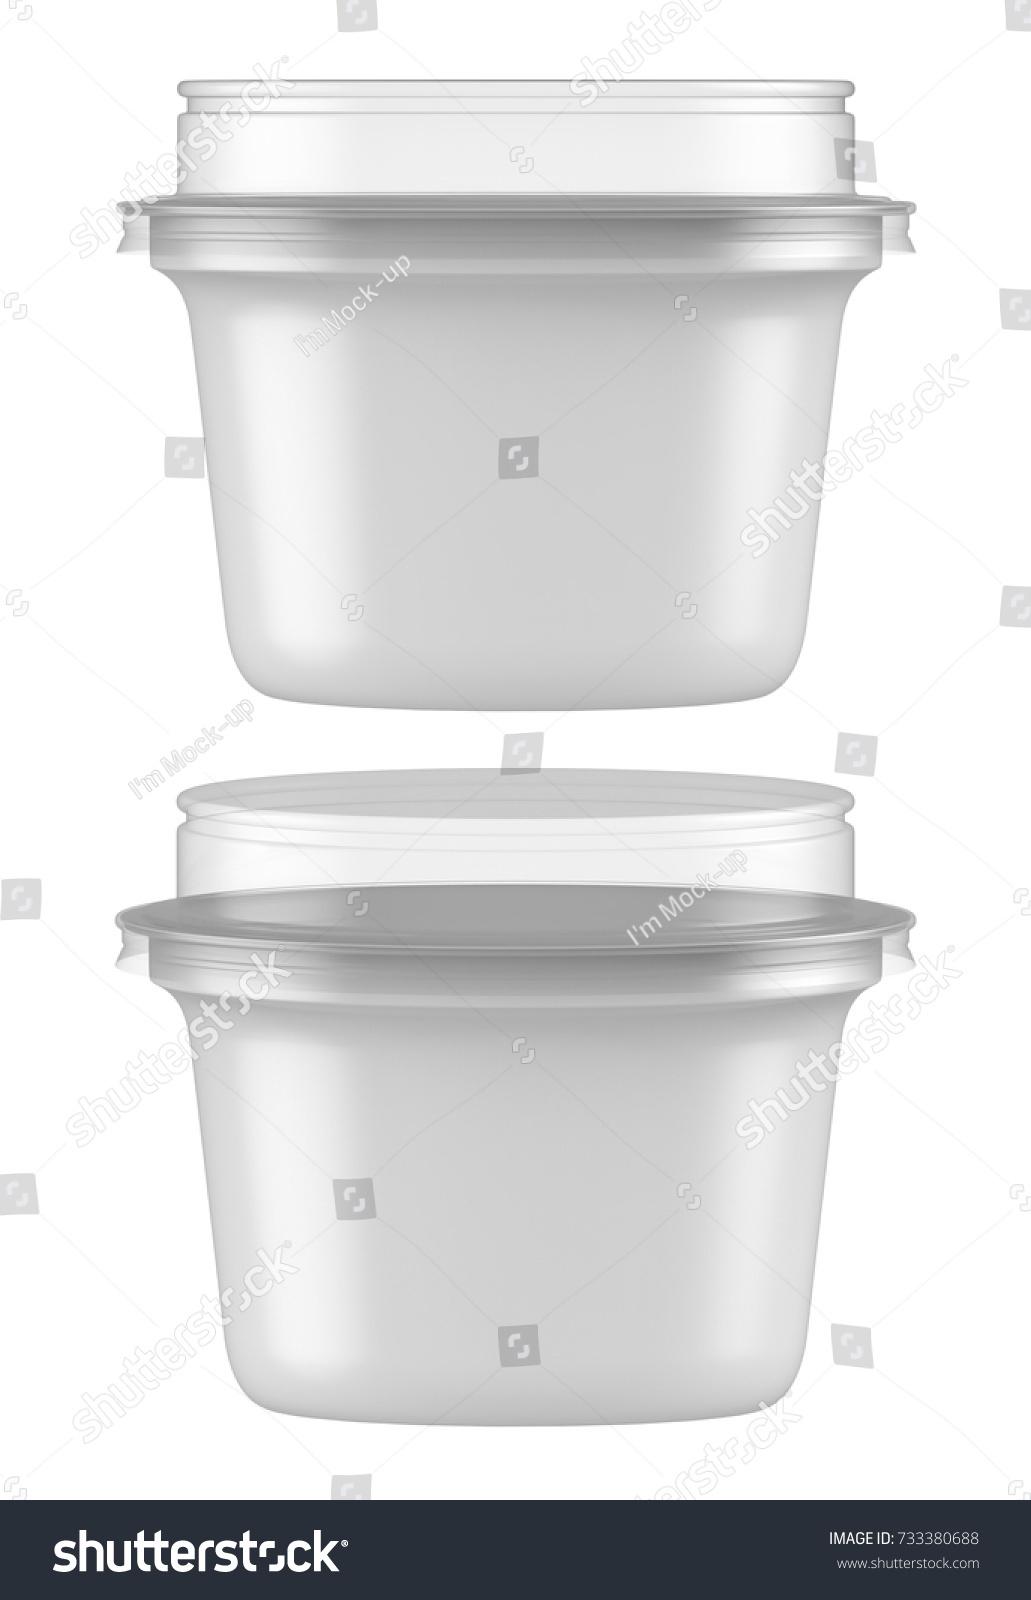 3 D Rendering Plastic Tub Clear Lid Stock Illustration 733380688 ...